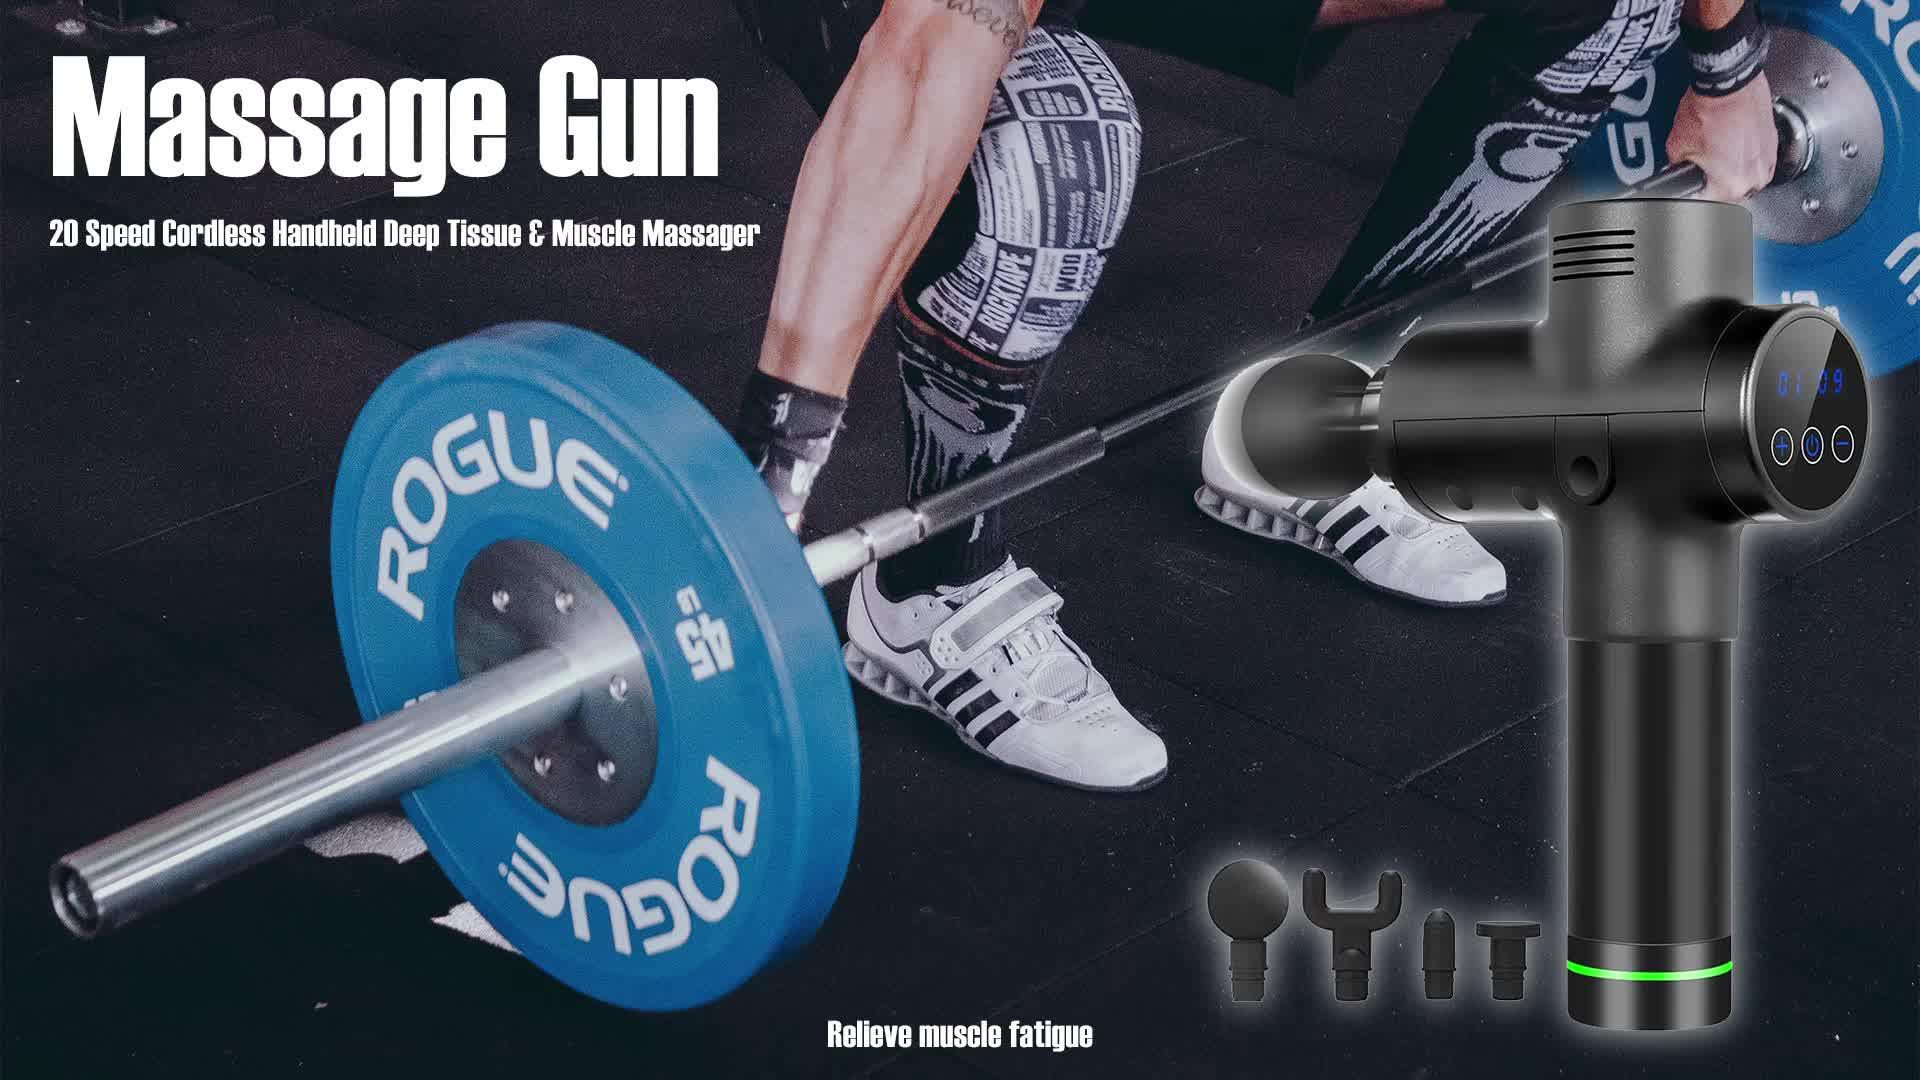 20 geschwindigkeiten Tiefe Gewebe Percussion Vibration Muscle Massage Gun